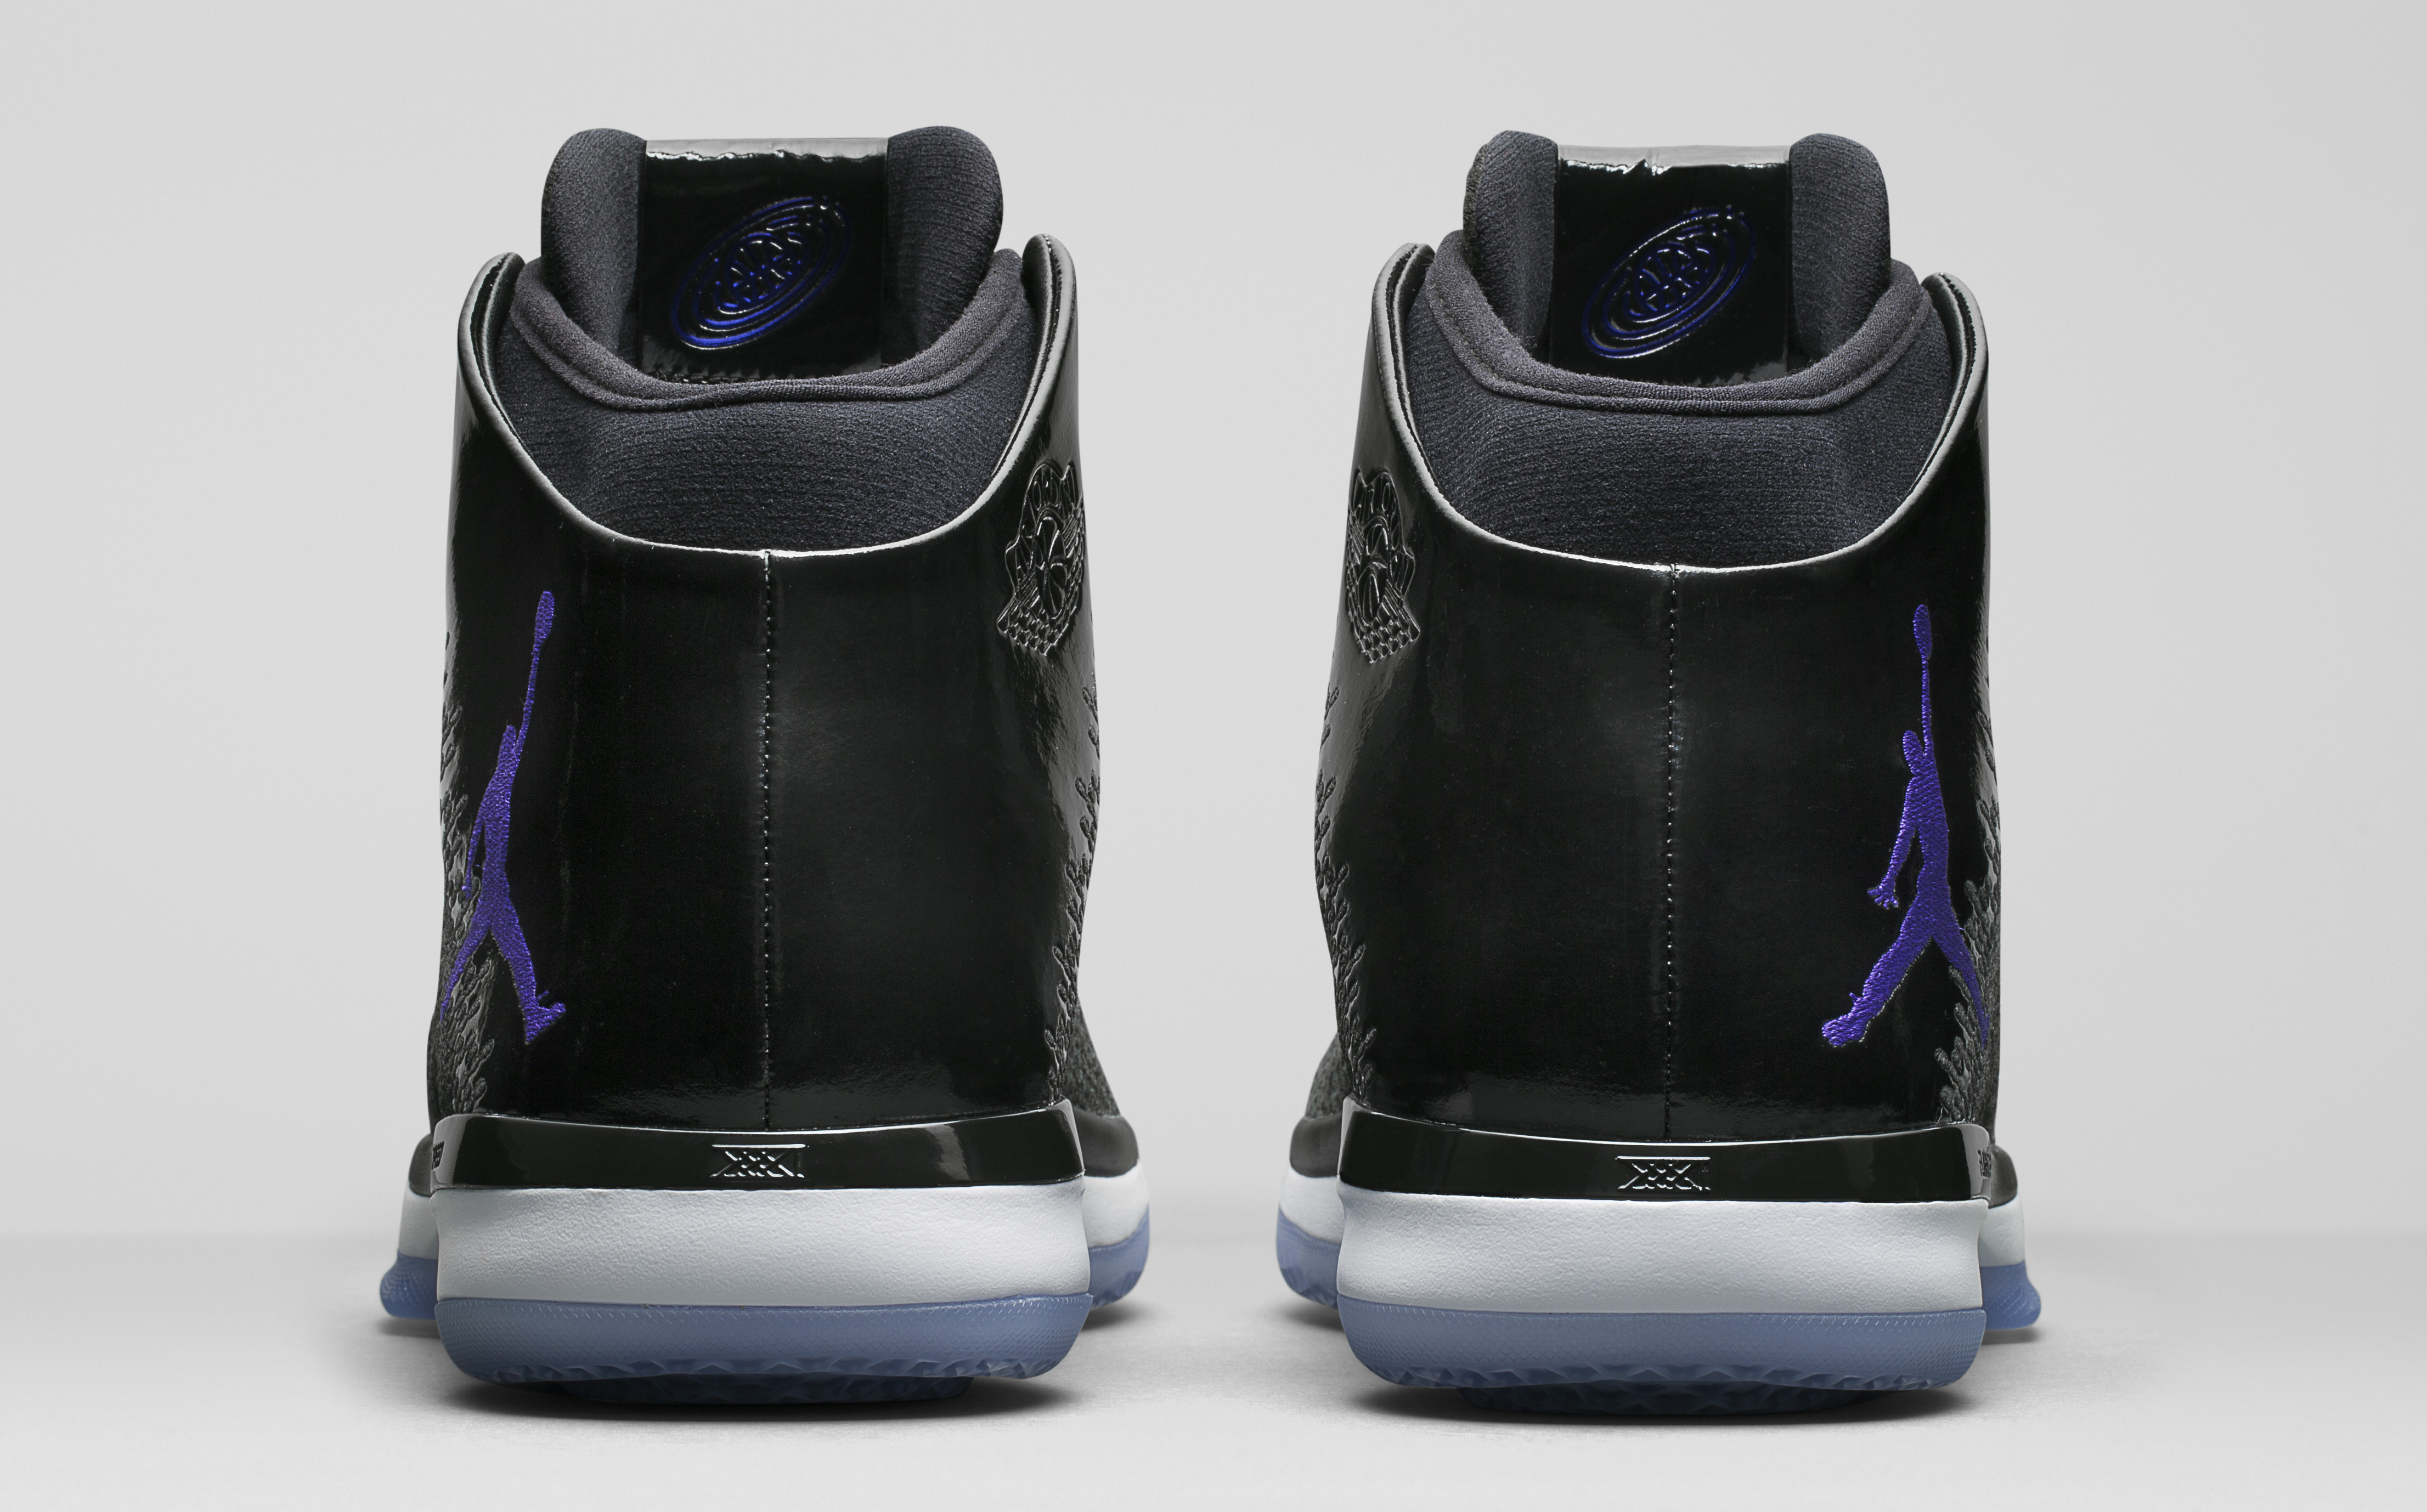 6918f976852ac5 Image via Nike Space Jam Jordan 31 Heel